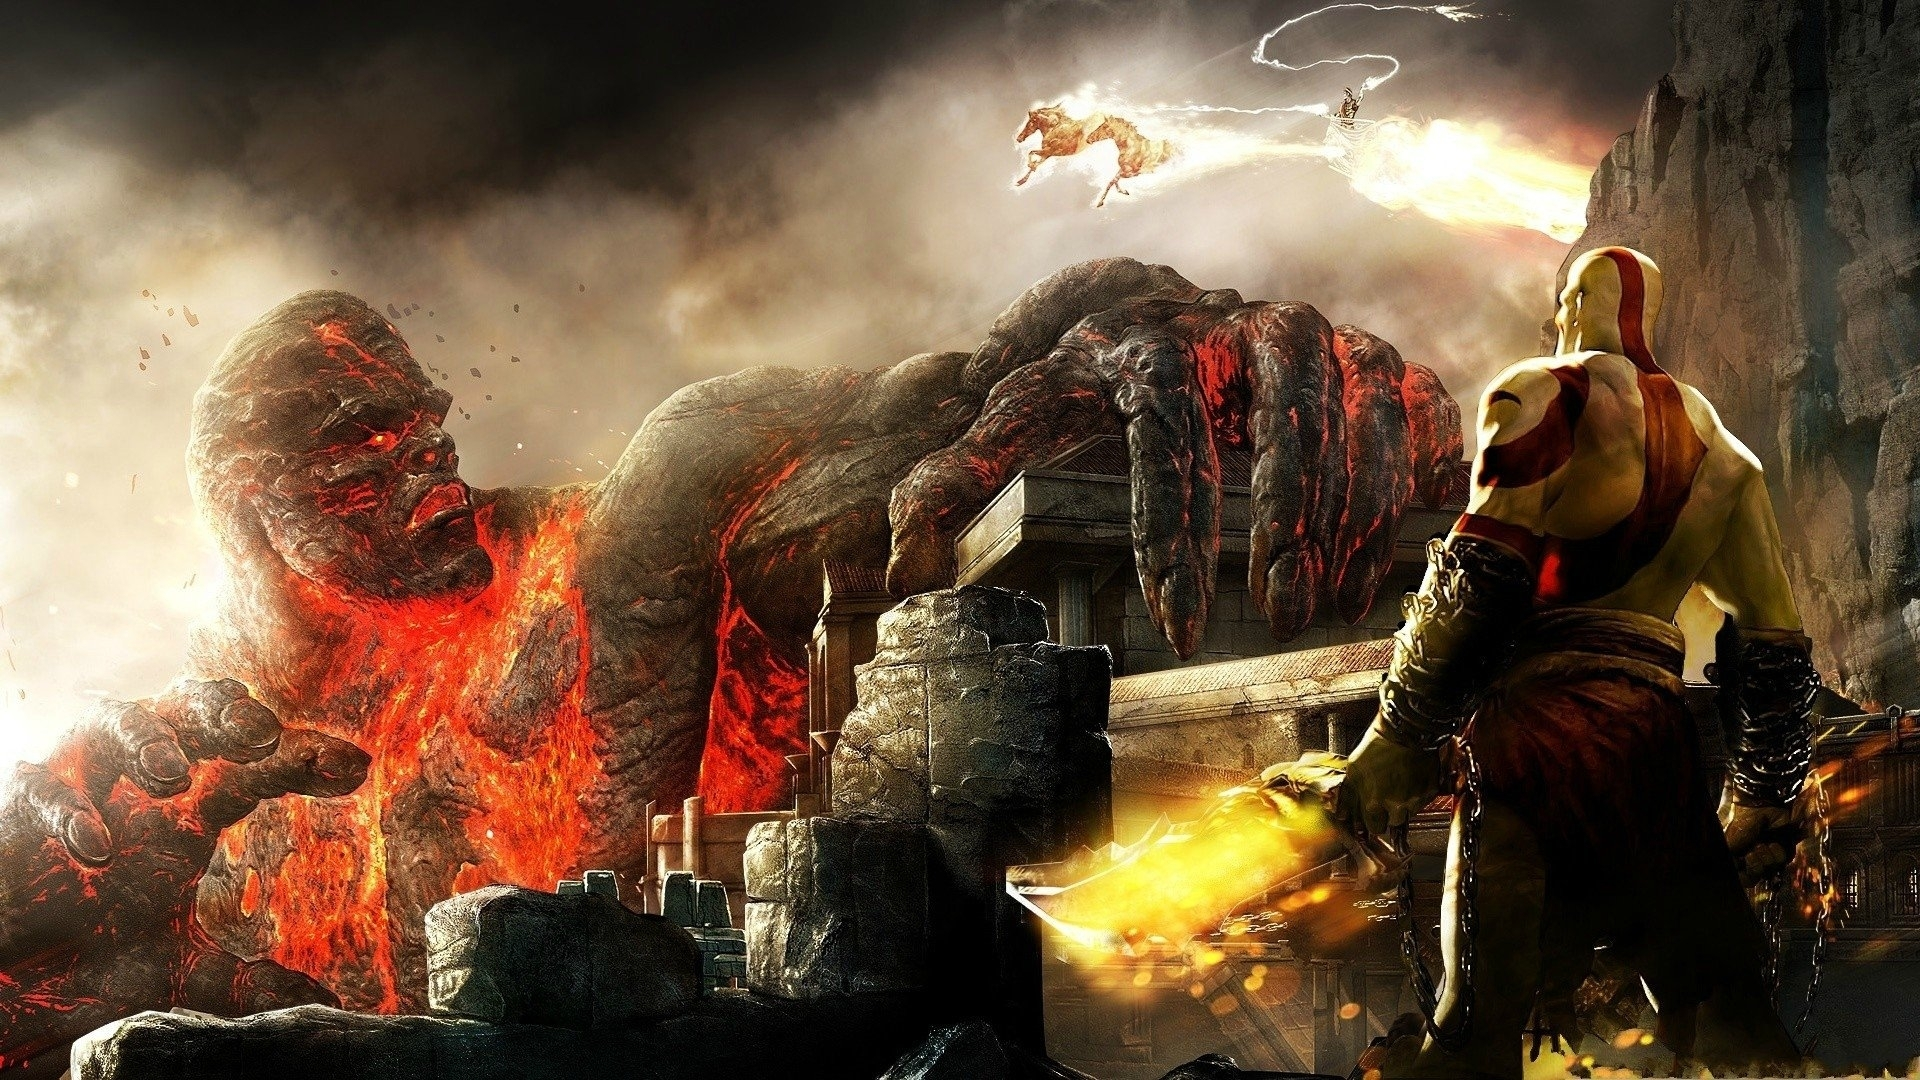 god of war iii full hd fond d'écran and arrière-plan | 1920x1080